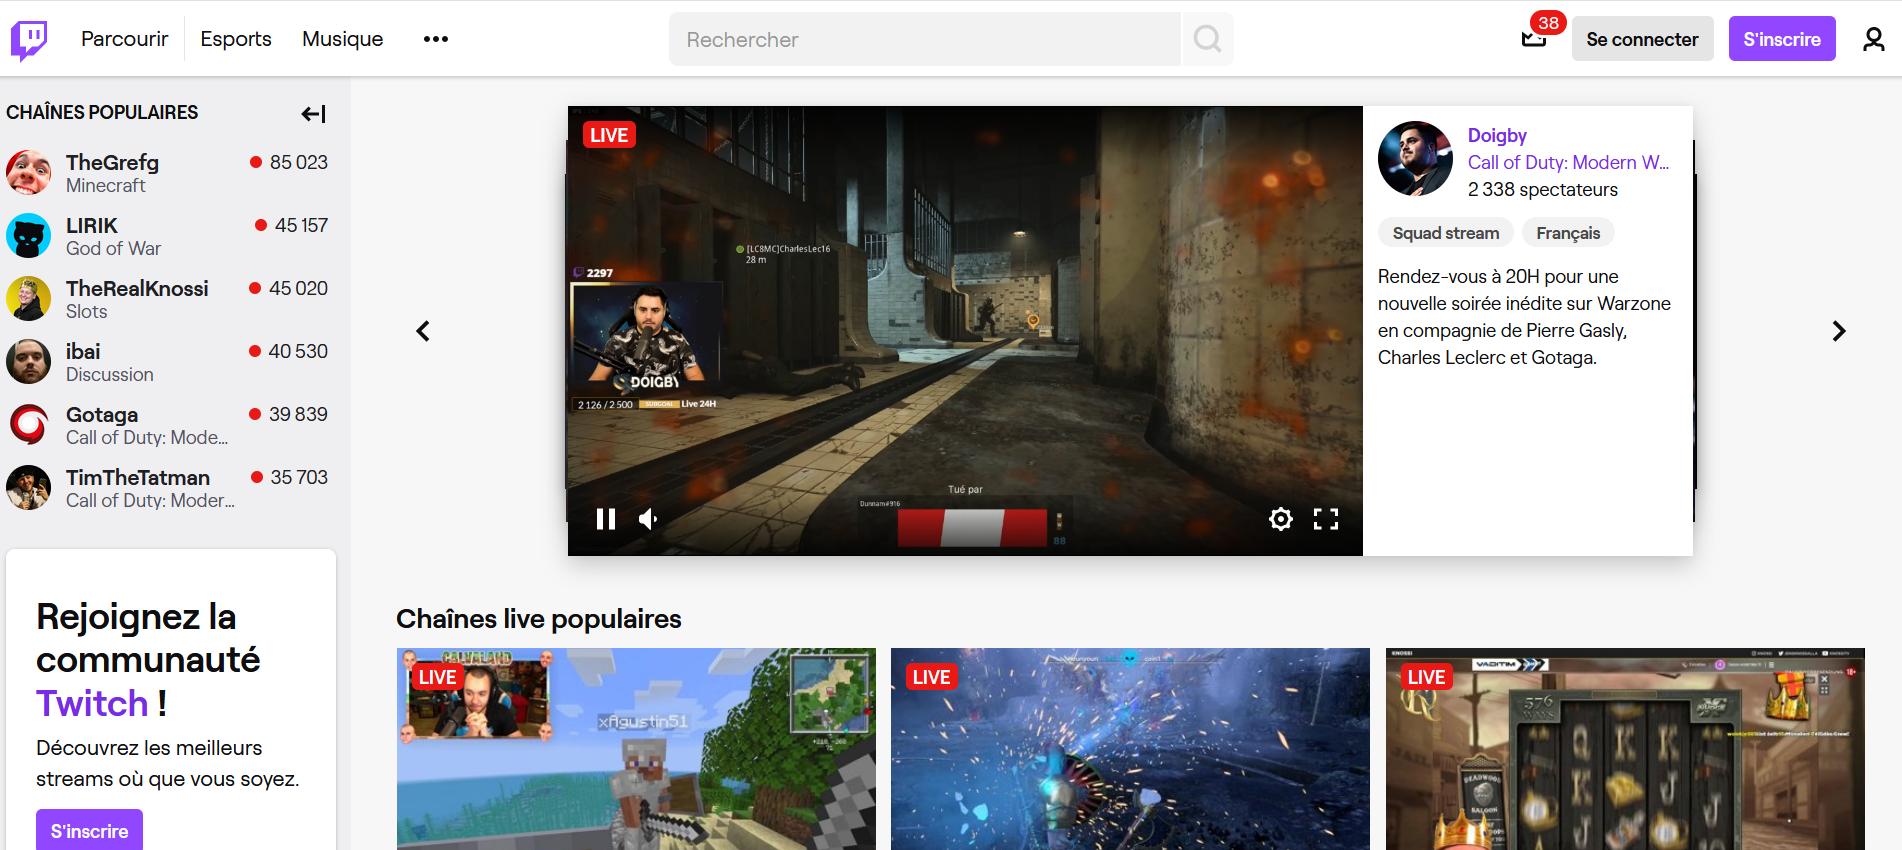 Aperçu Twitch TV - Smart TV - Télé connectée